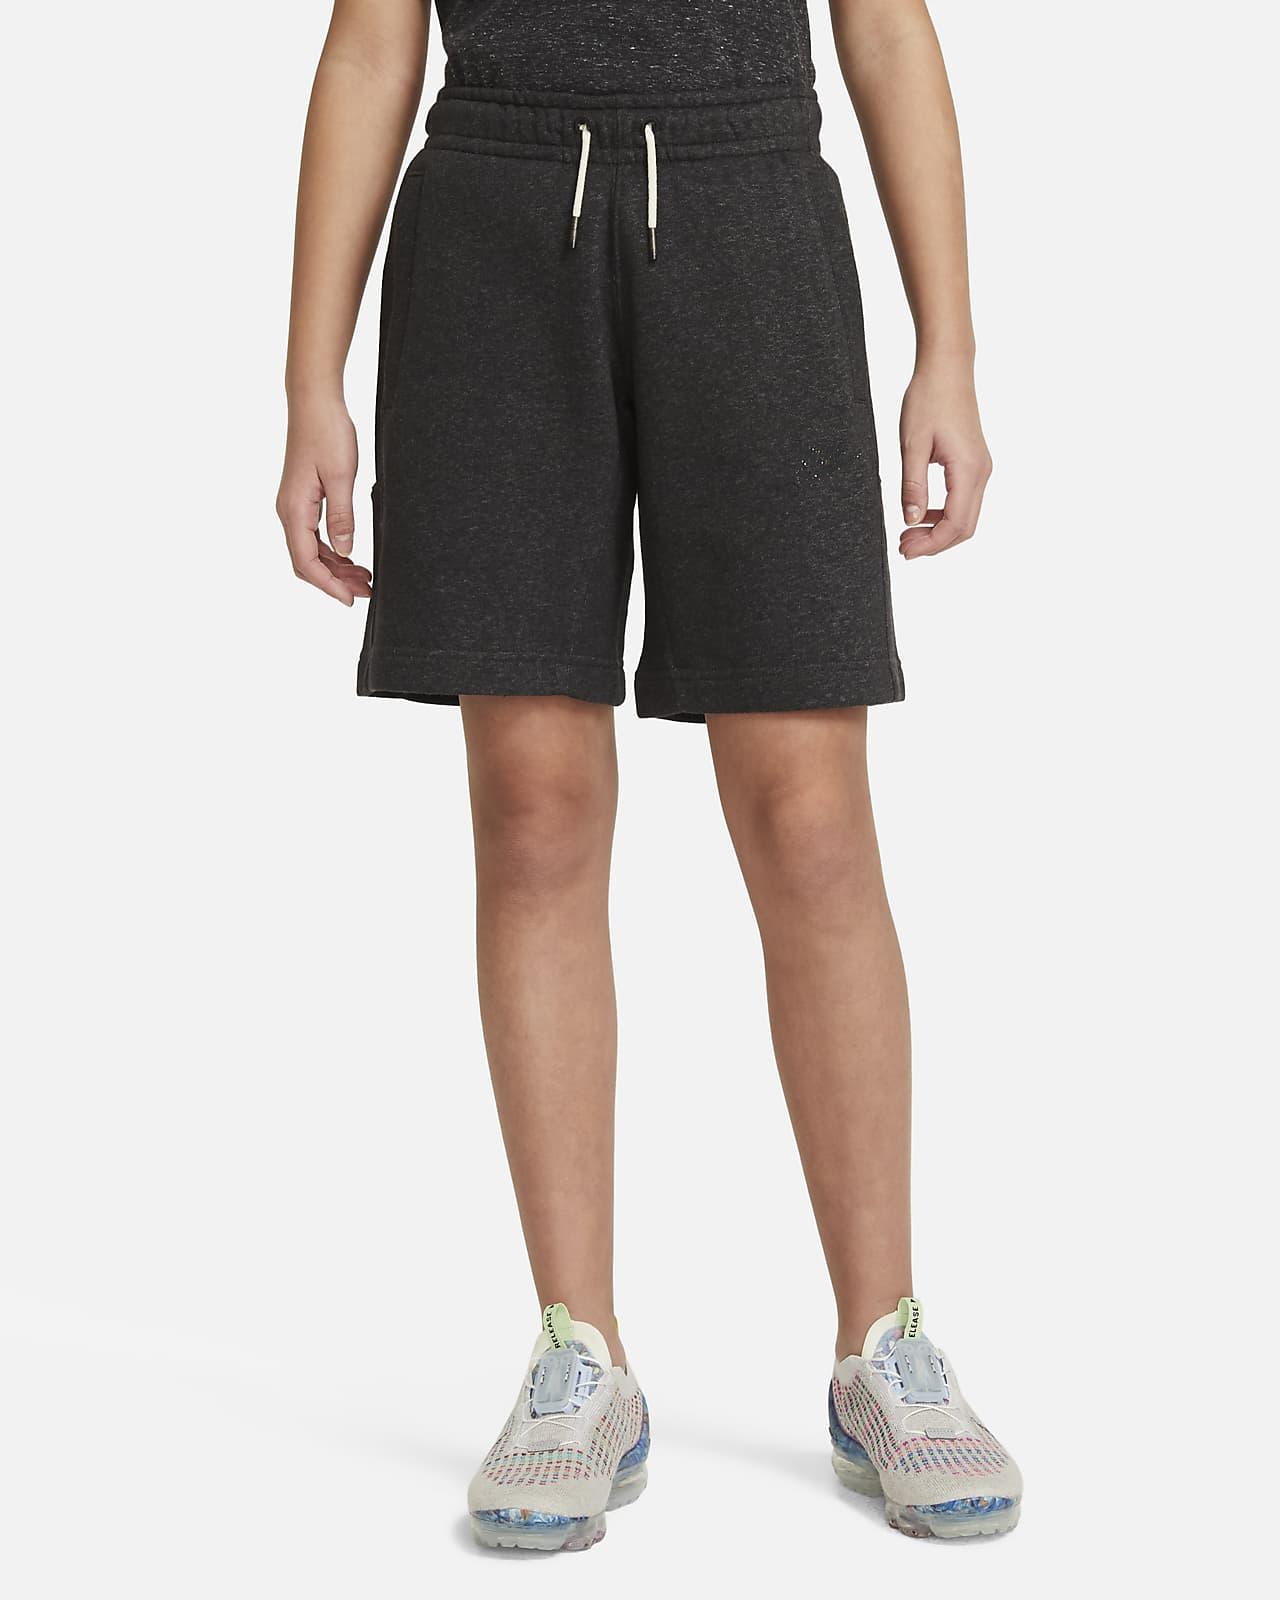 Nike Sportswear Kindershorts